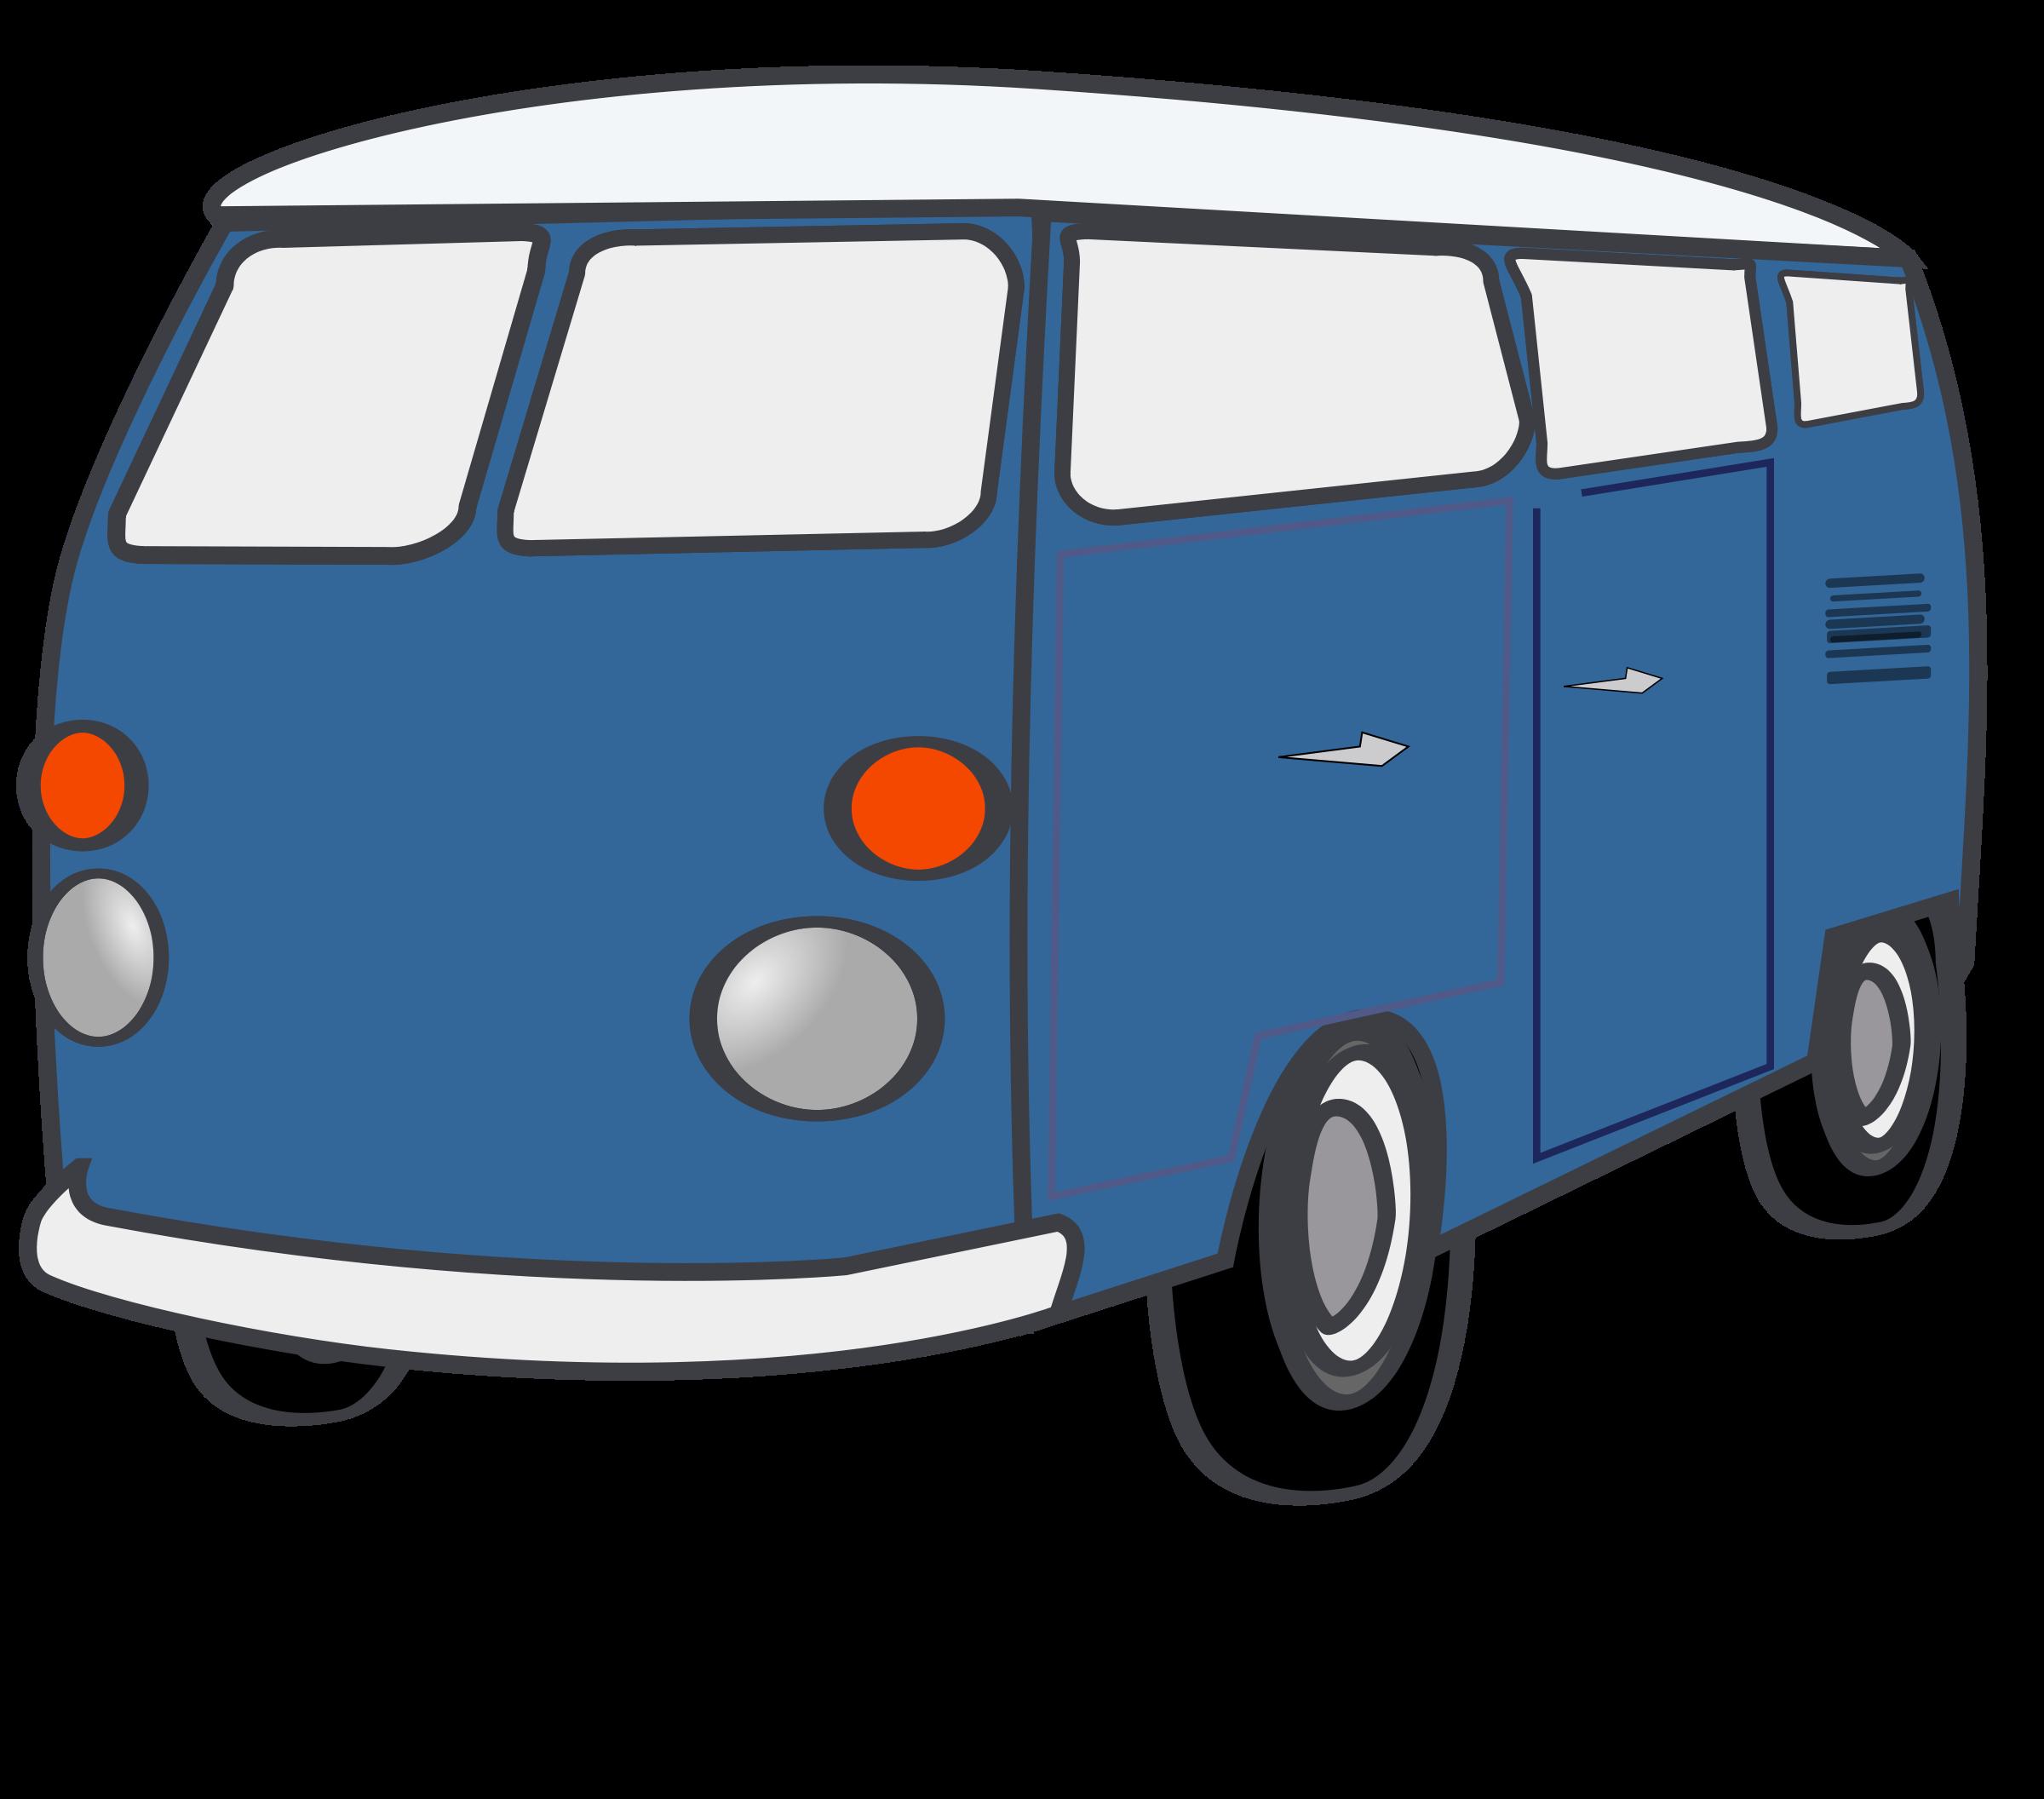 Vans clipart Clipart Clipart van Free Clipart